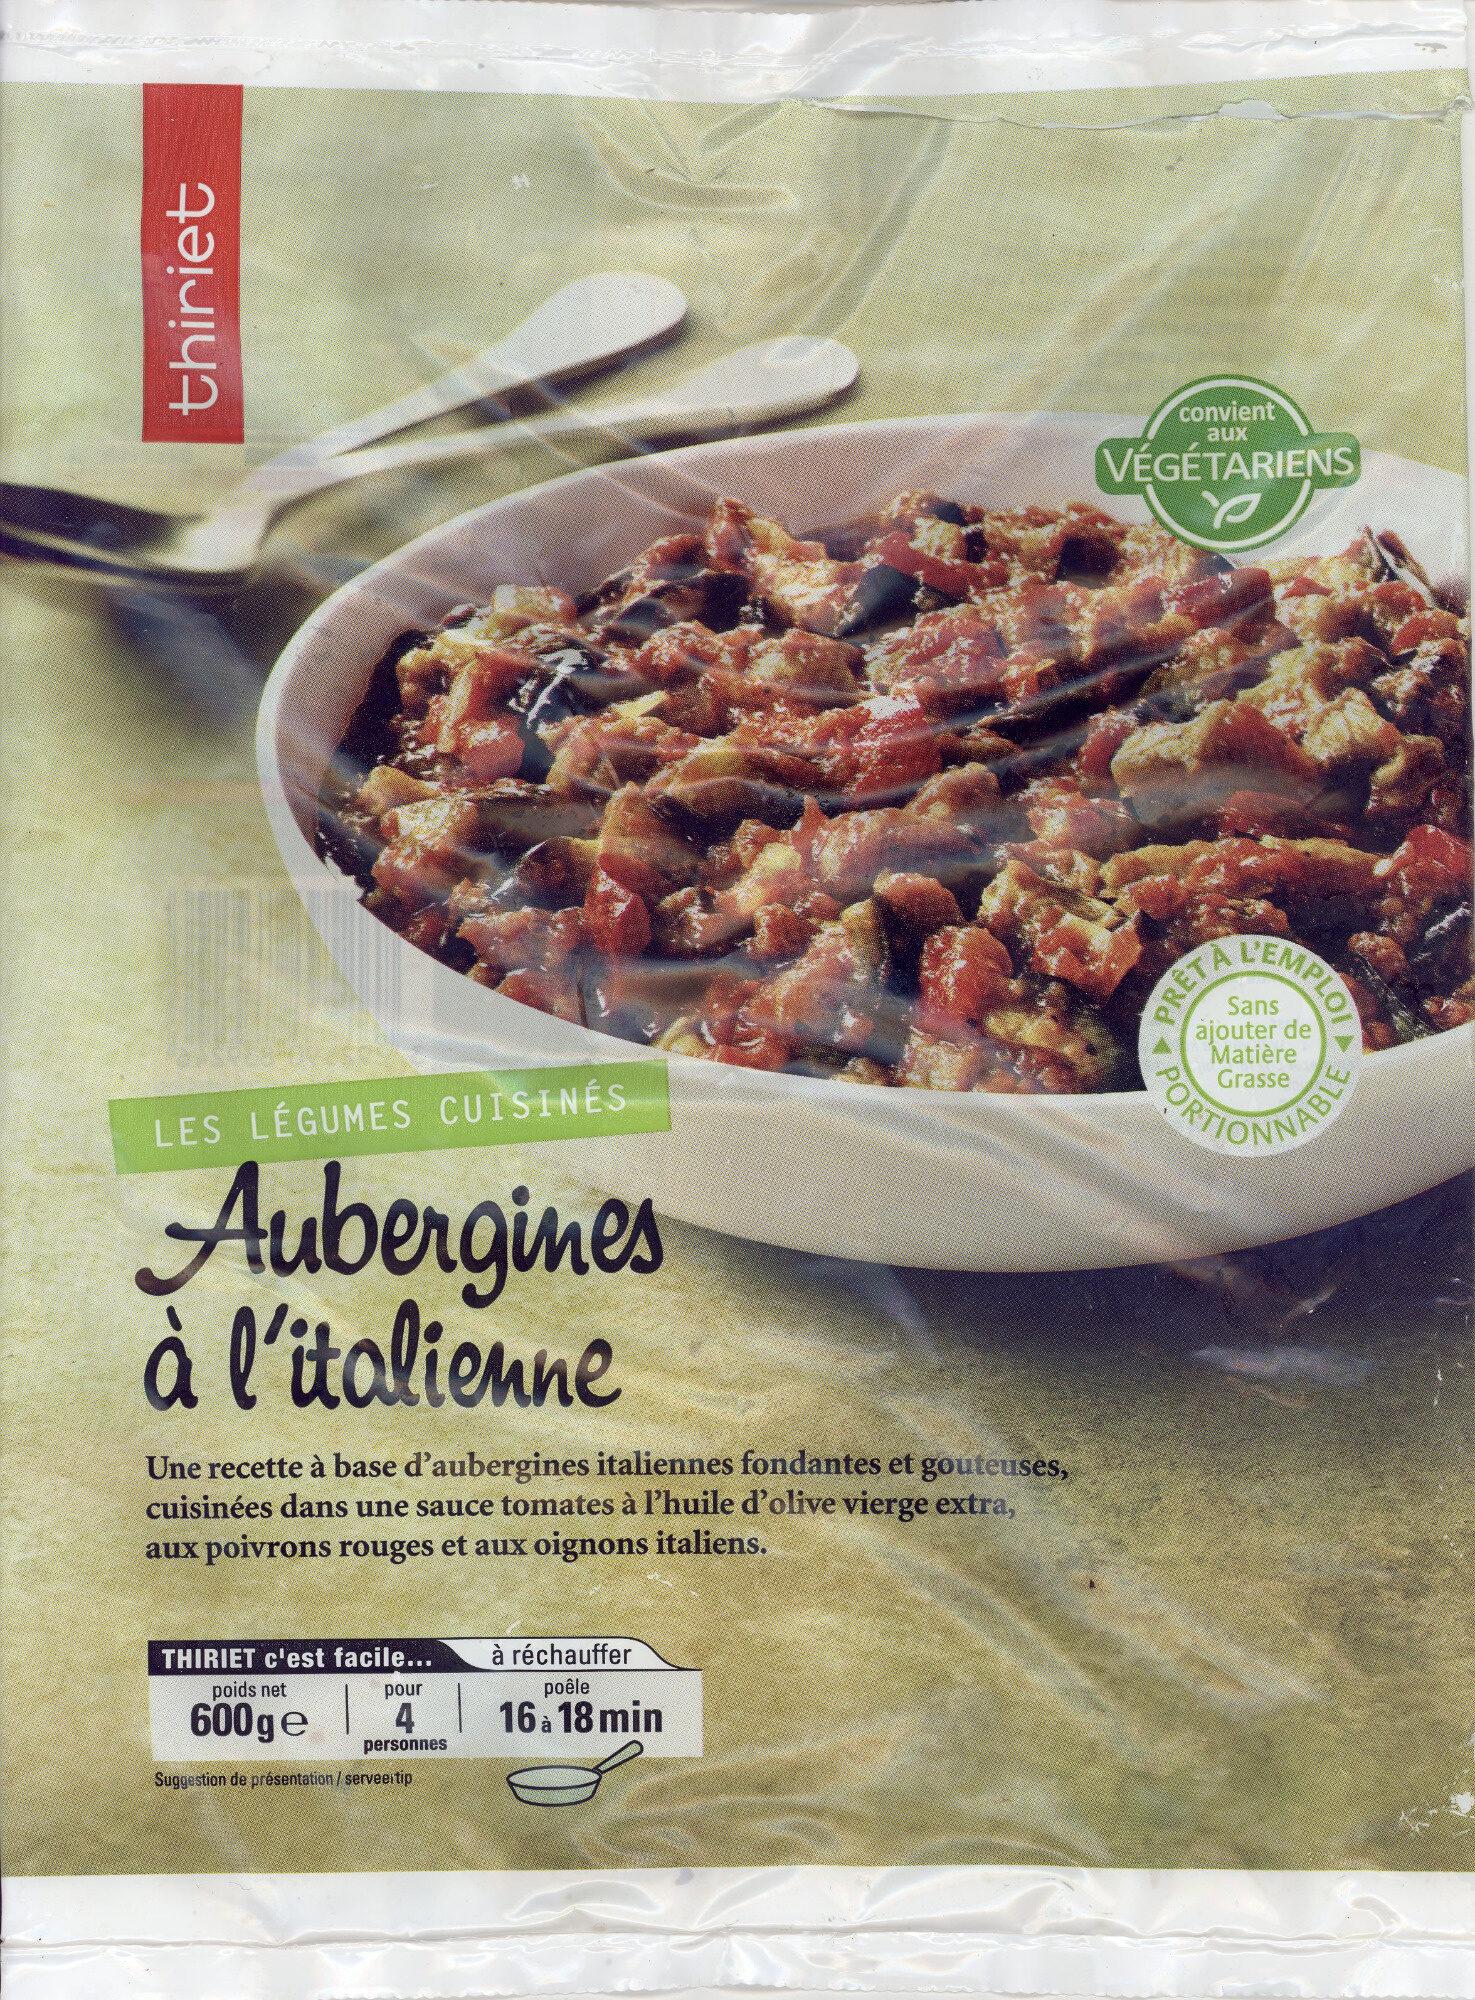 Aubergines à l'italienne - Product